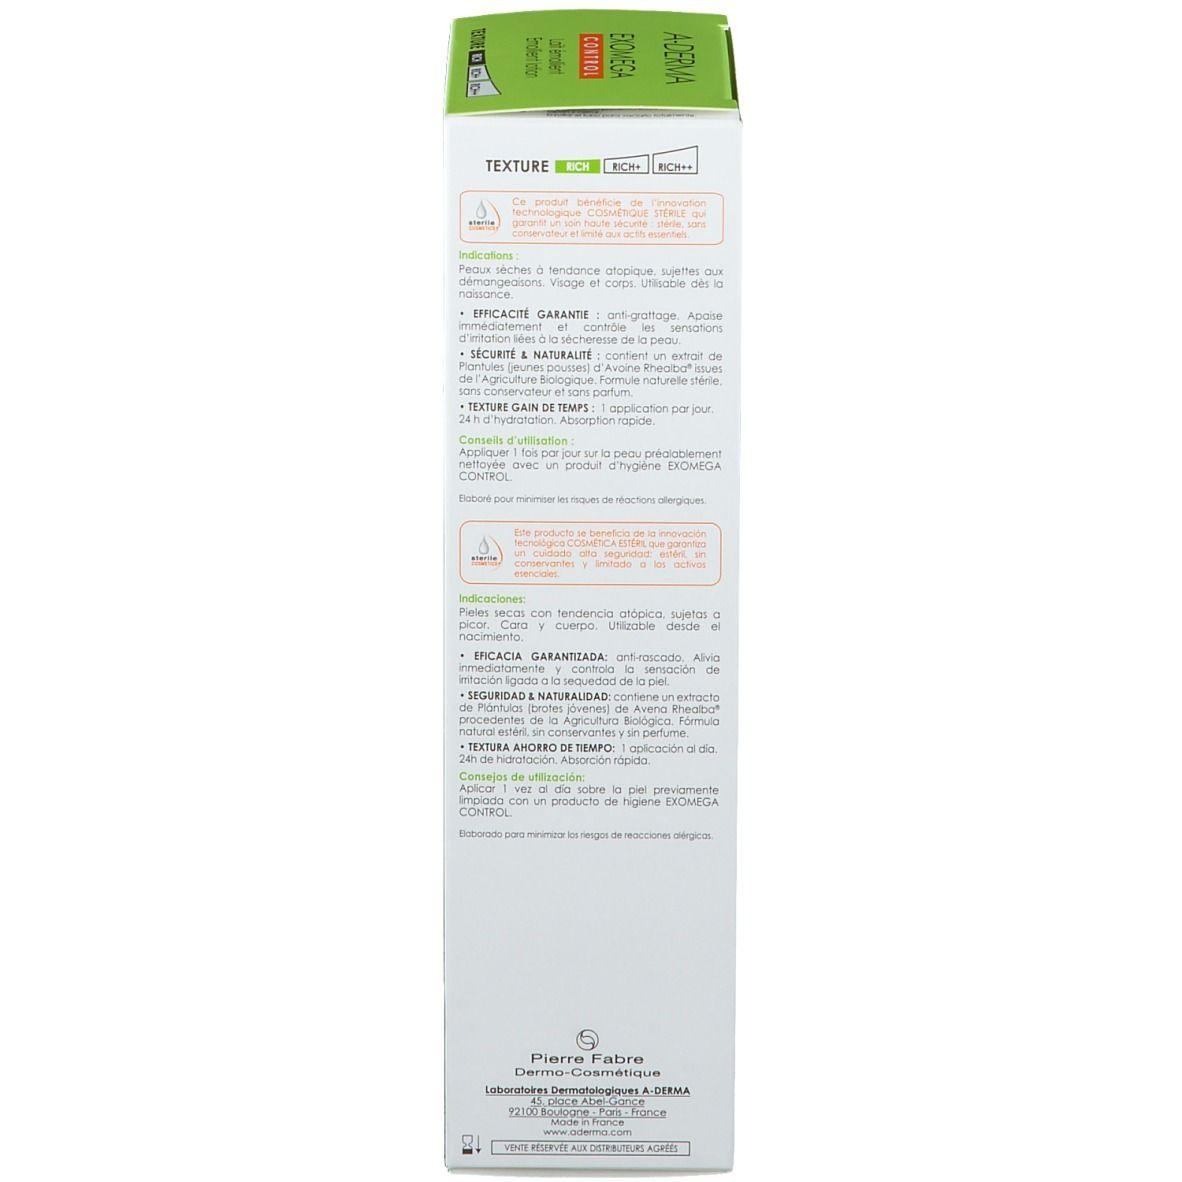 B. EXOMEGA Control Milch Sterile Kosmetik 200 ml